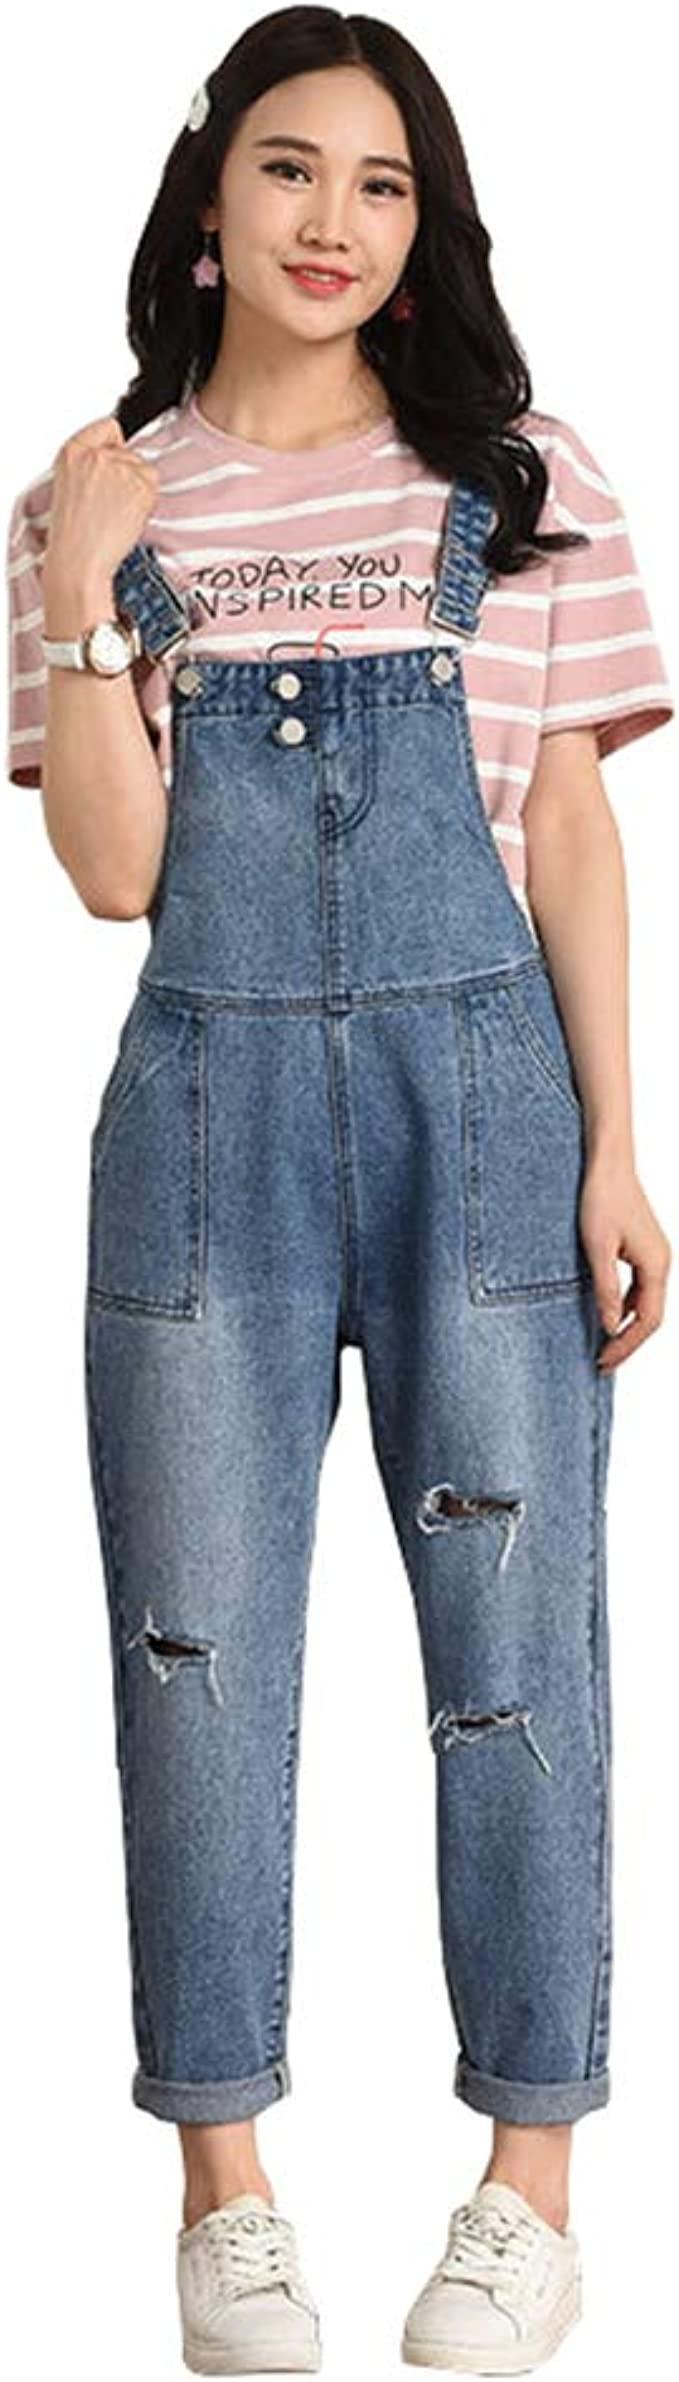 34-48 Damen Hose Overalls Jumpsuits Cargohose Latz Lässig Jeans Denim Stofhose